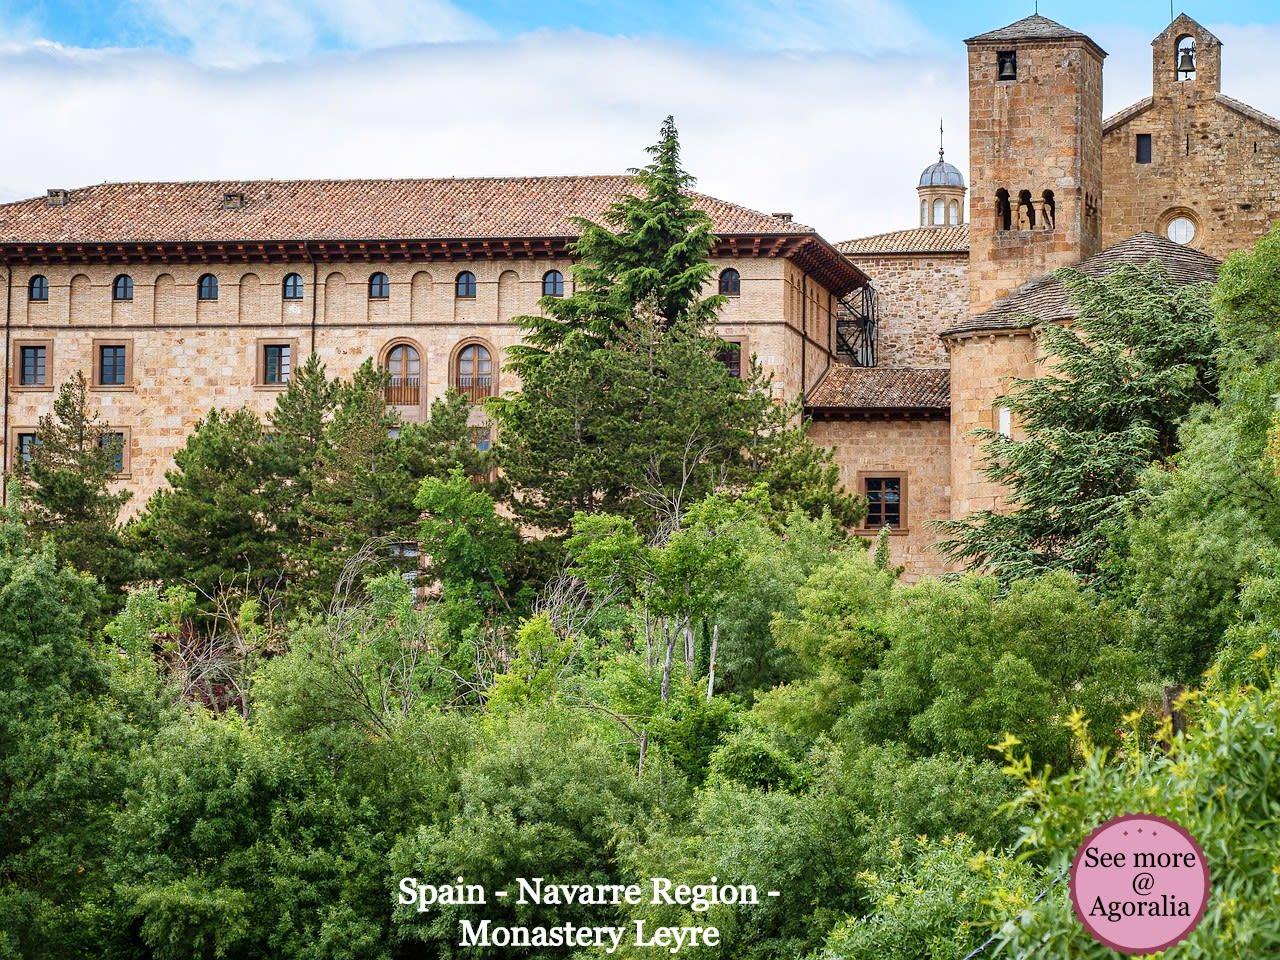 Spain-Navarre-Region-Monastery-Leyre